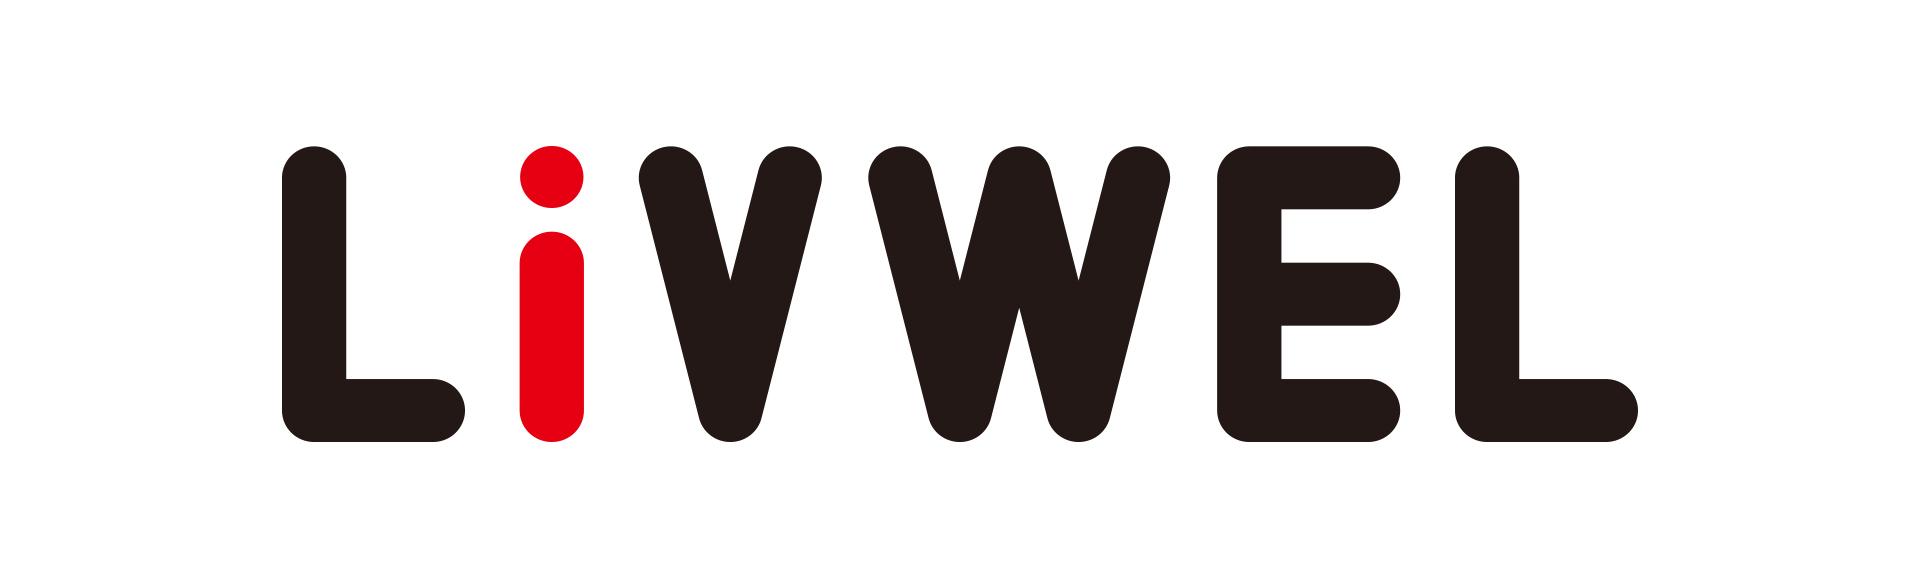 LiVWEL株式会社ロゴ